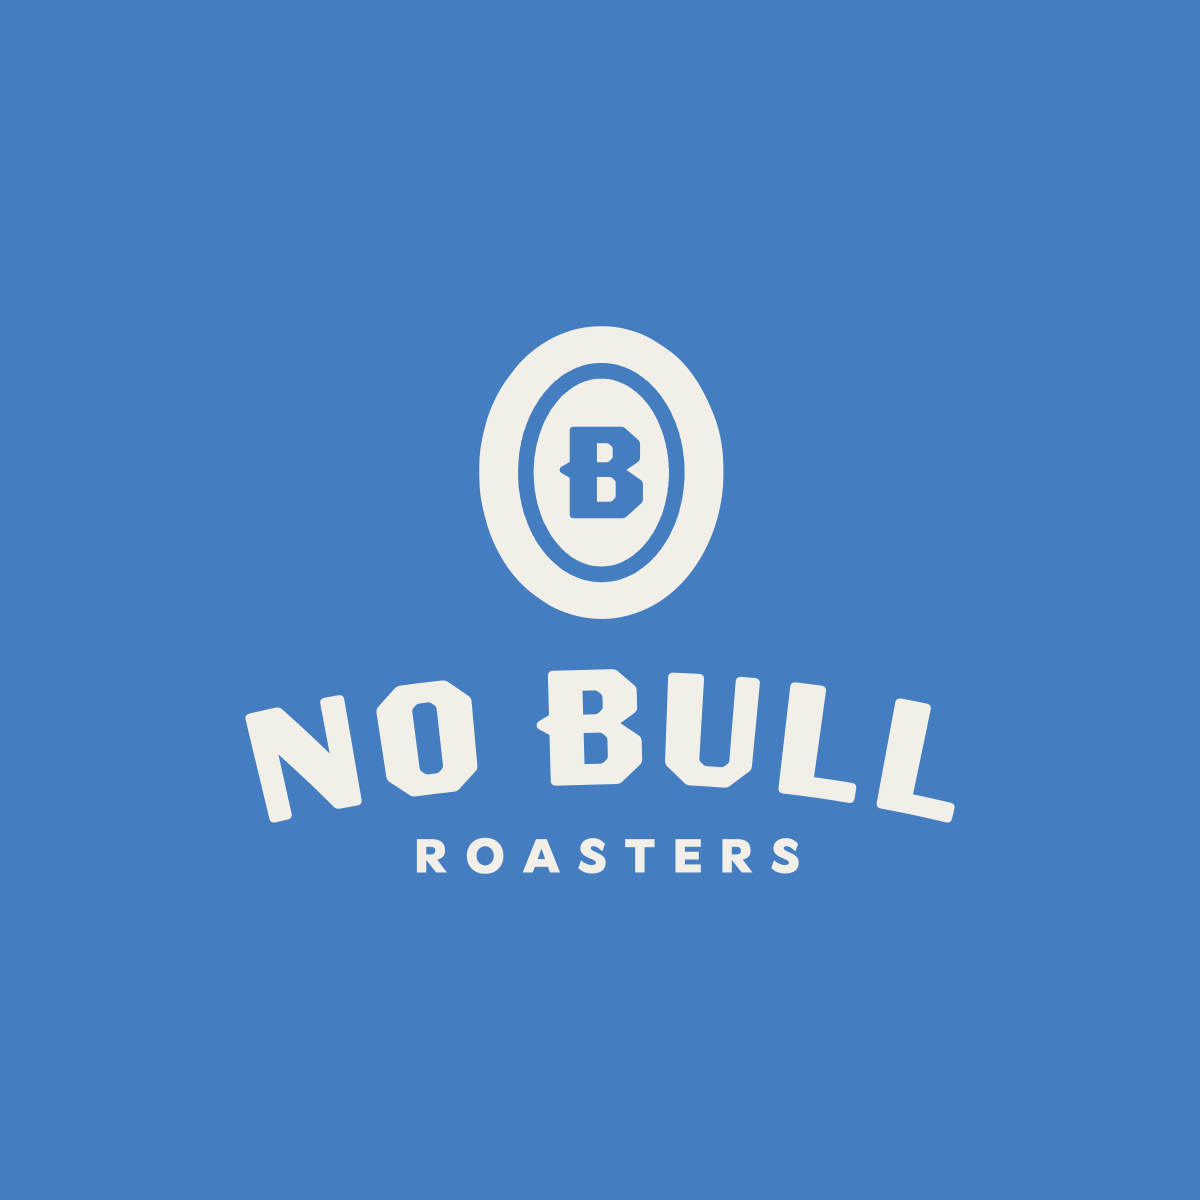 No Bull Roasters Brand Design | Pace Creative Design Studio